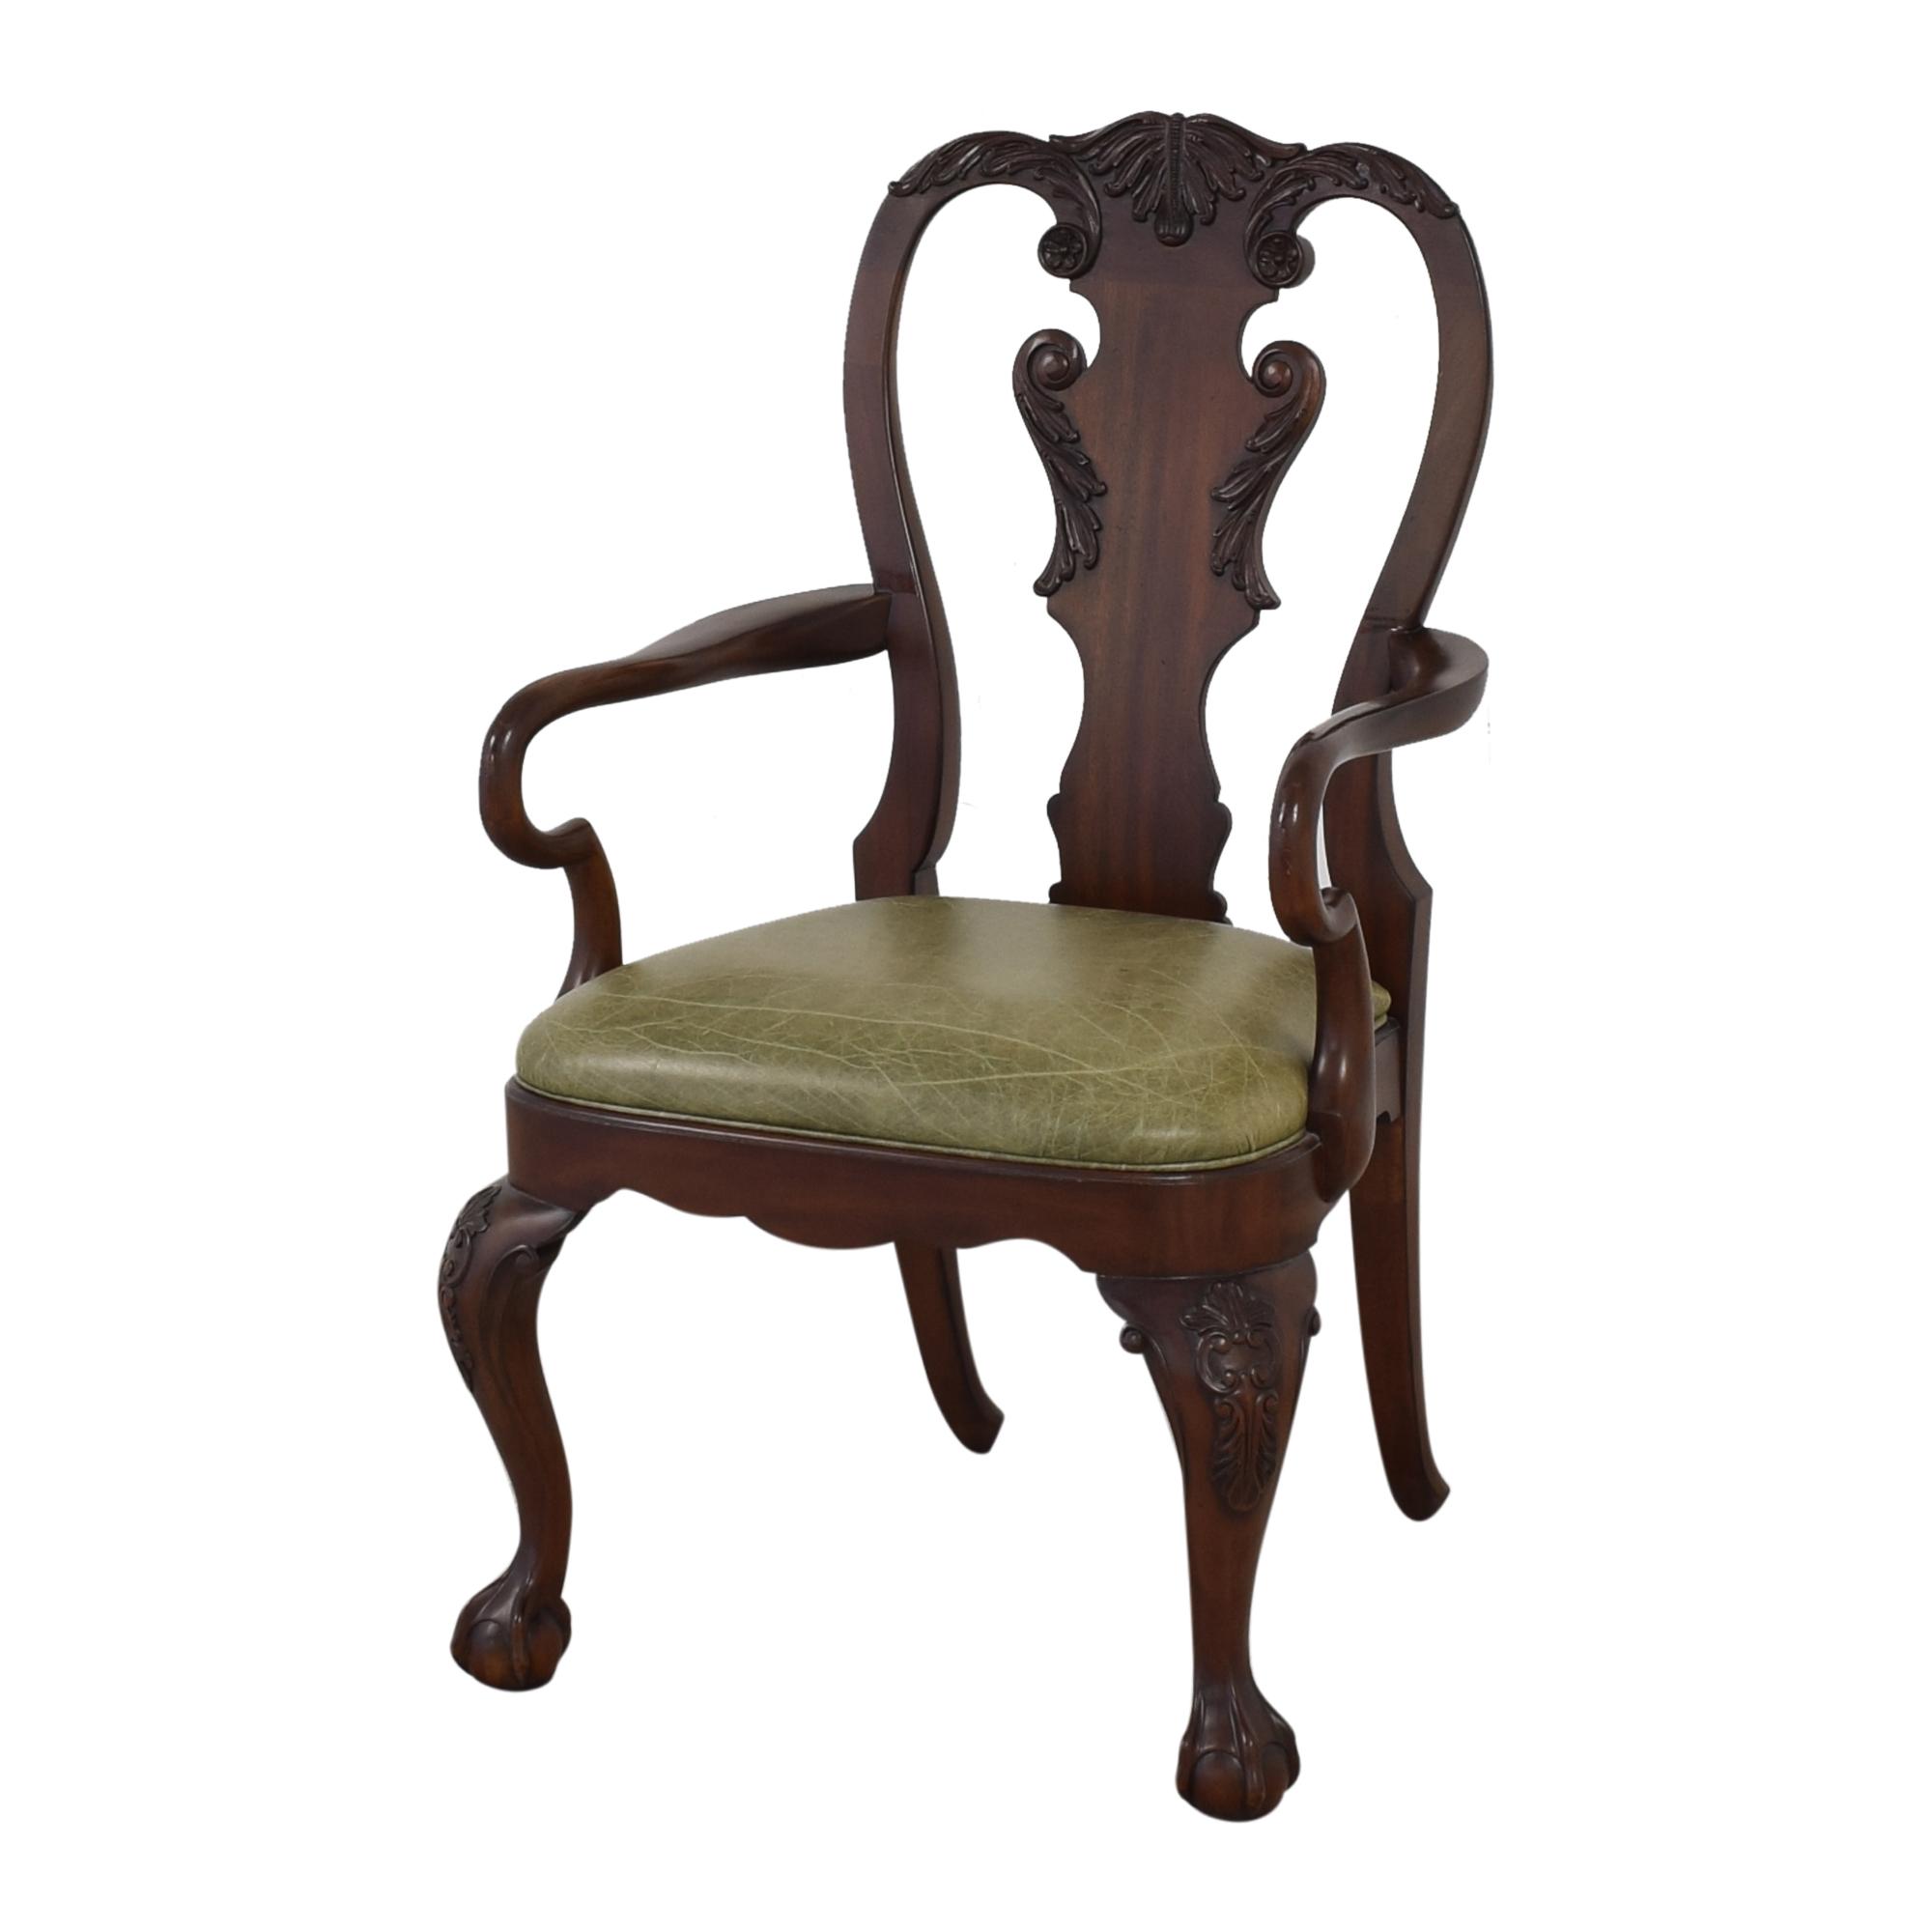 Ethan Allen Ethan Allen Queen Anne Dining Arm Chairs Chairs